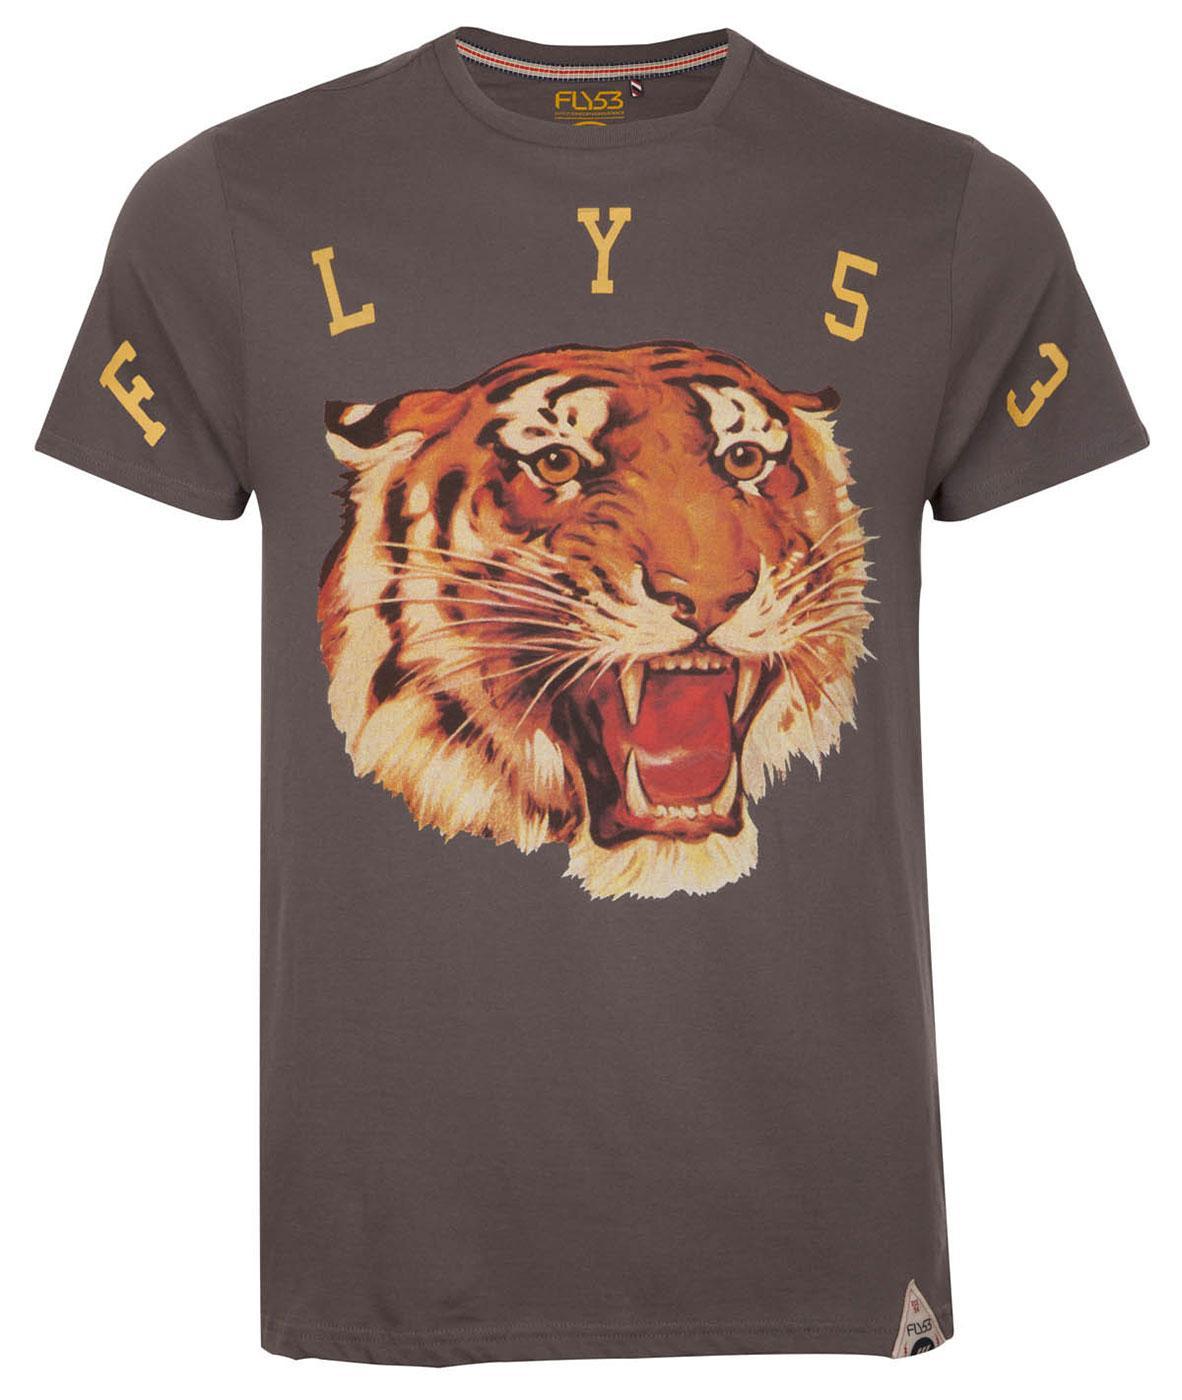 Fly53 balboa retro seventies indie tiger print vintage t shirt for Vintage t shirt printing